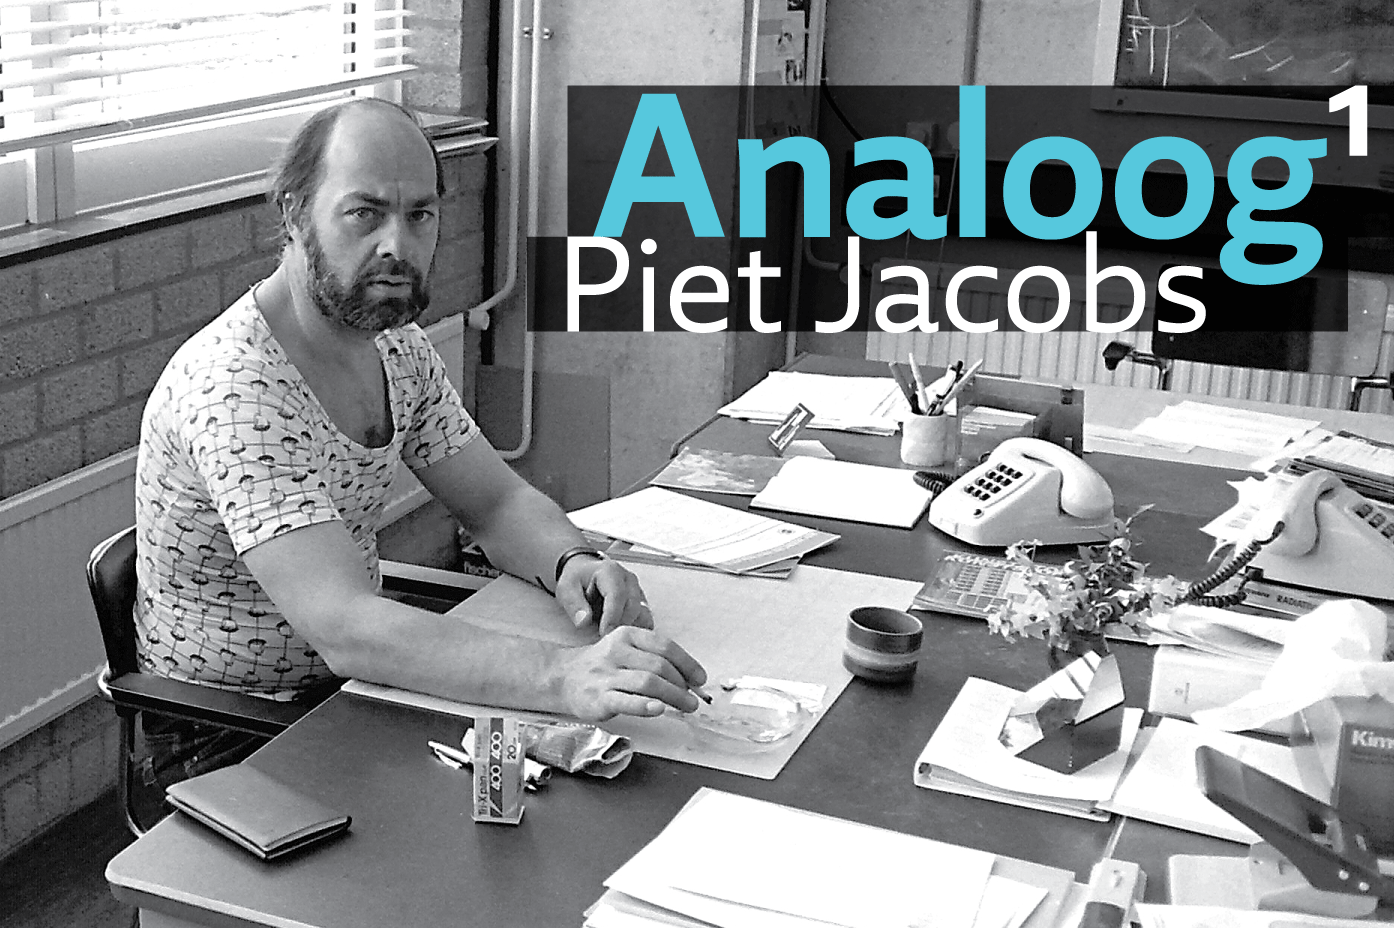 Analoog #1: Interview with Piet Jacobs